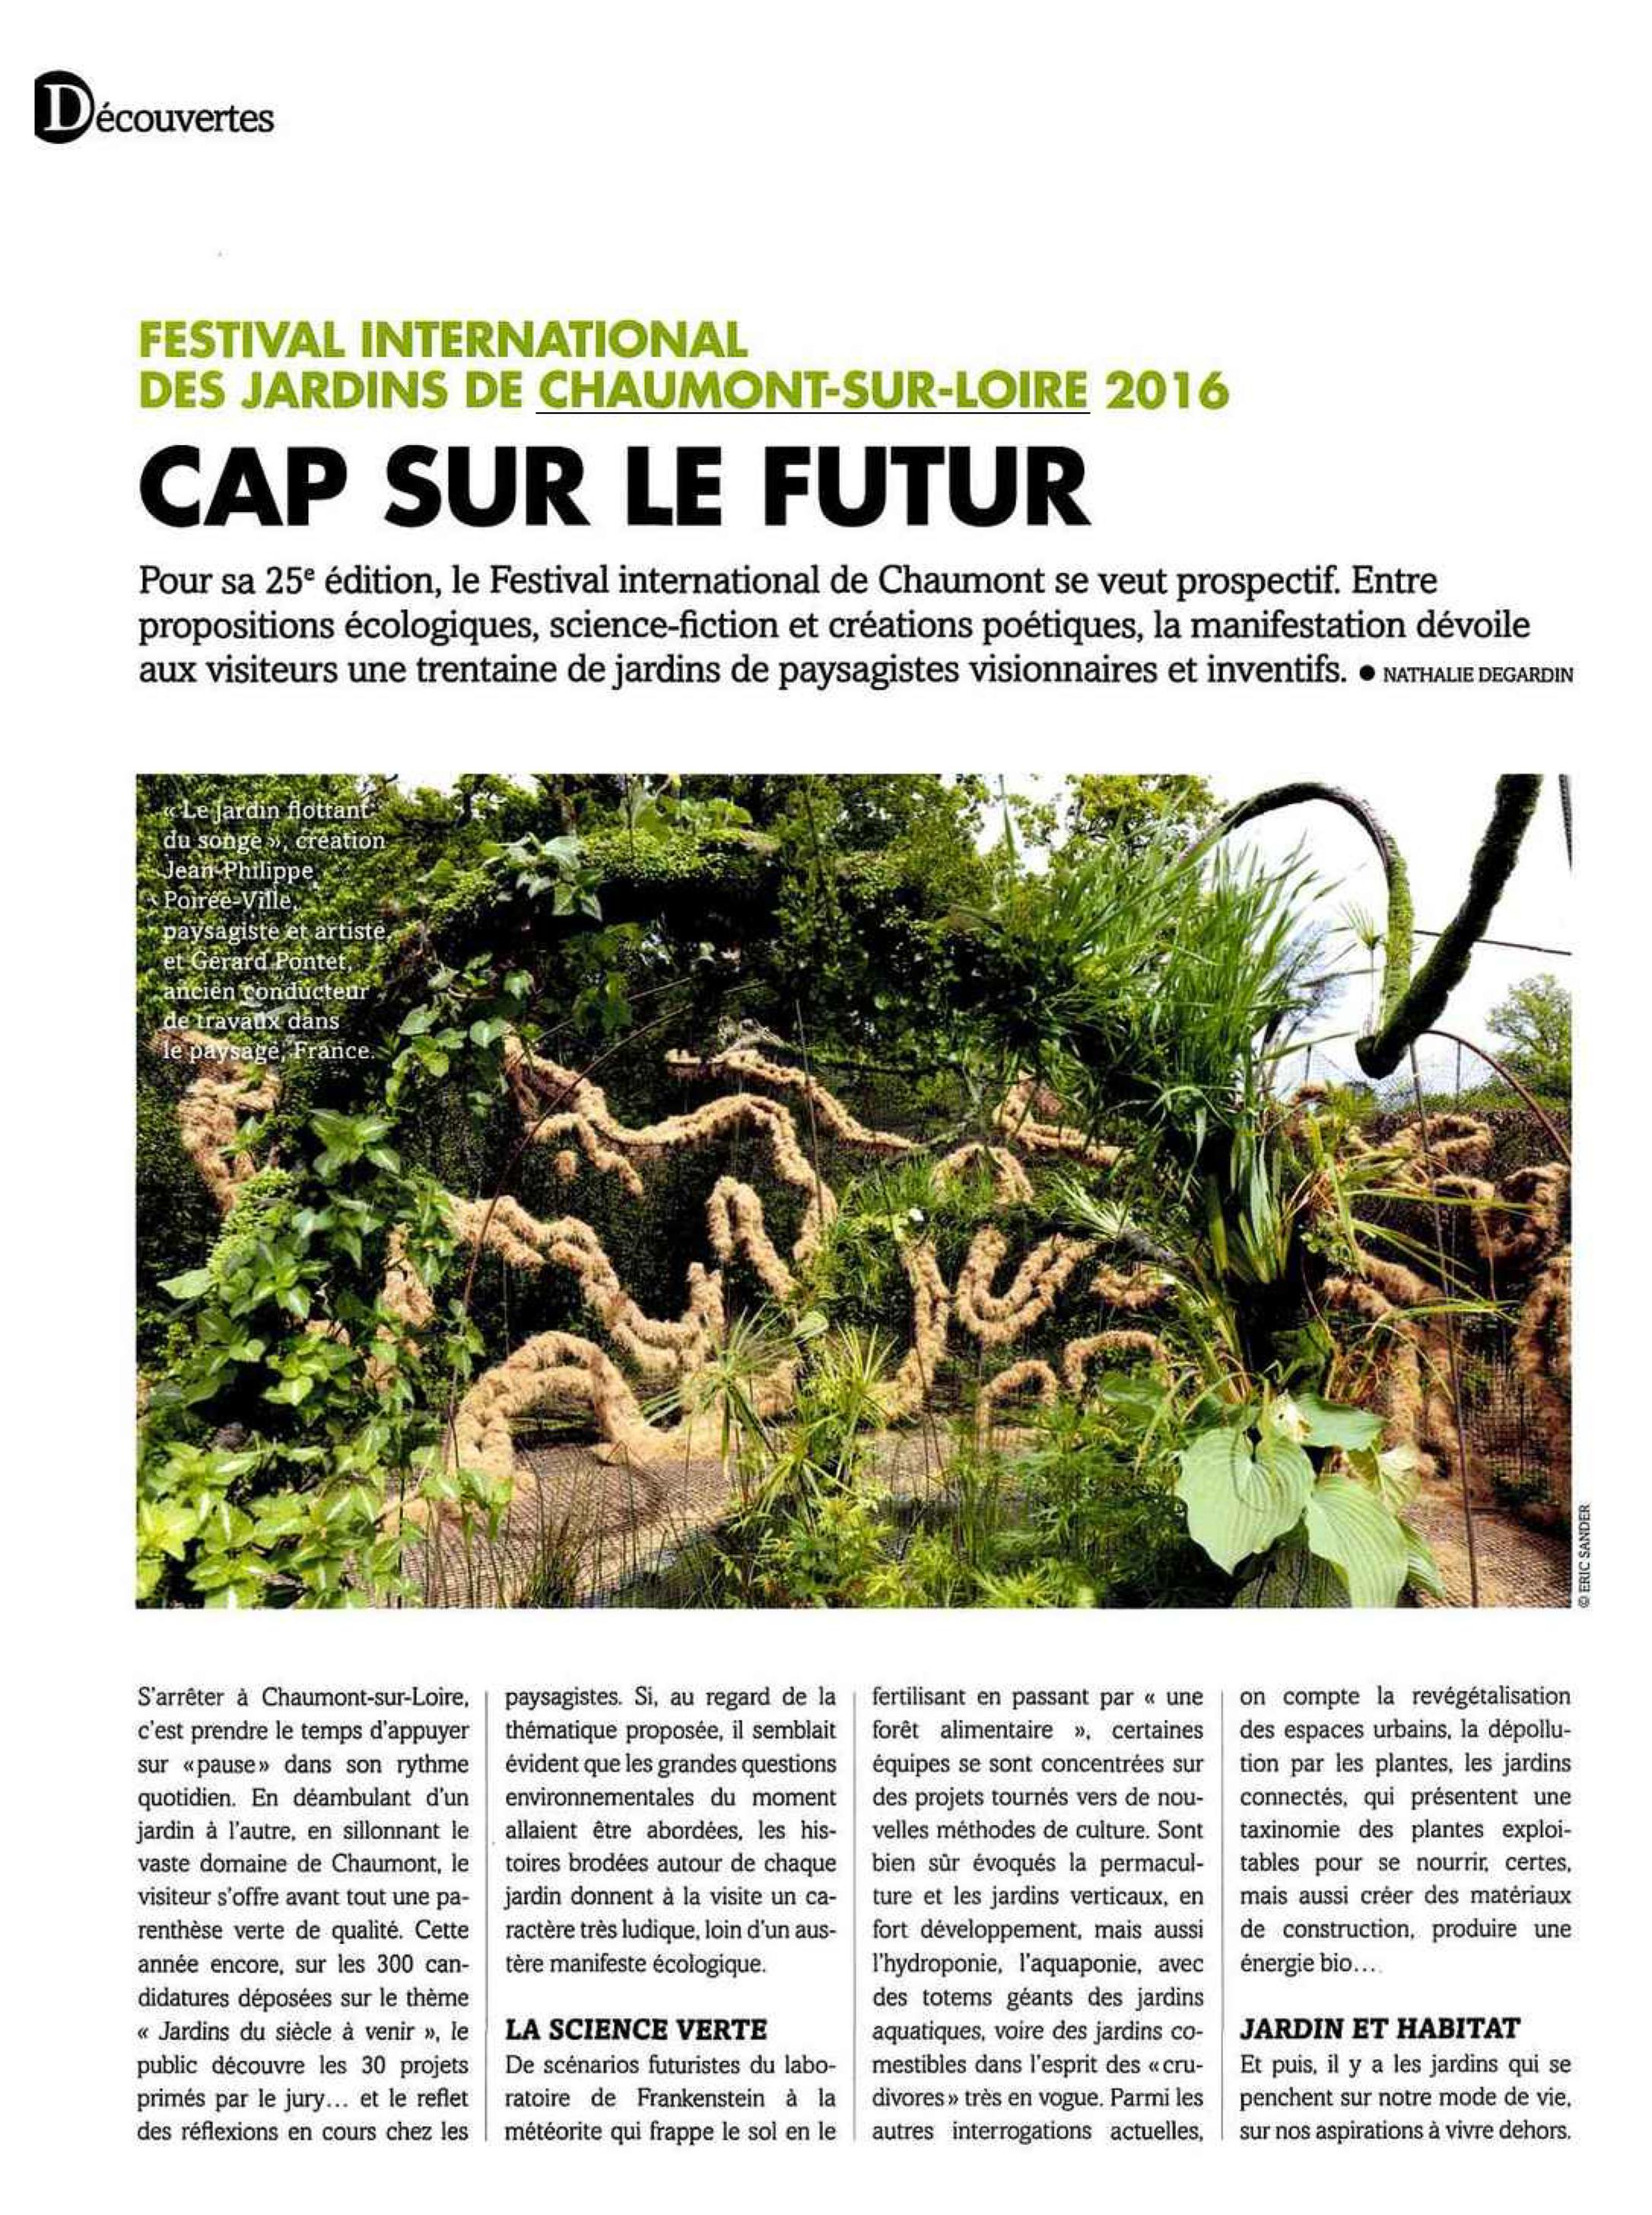 ExterieurDesignMagazine-30062016-1-Simonson-Landscape.jpg